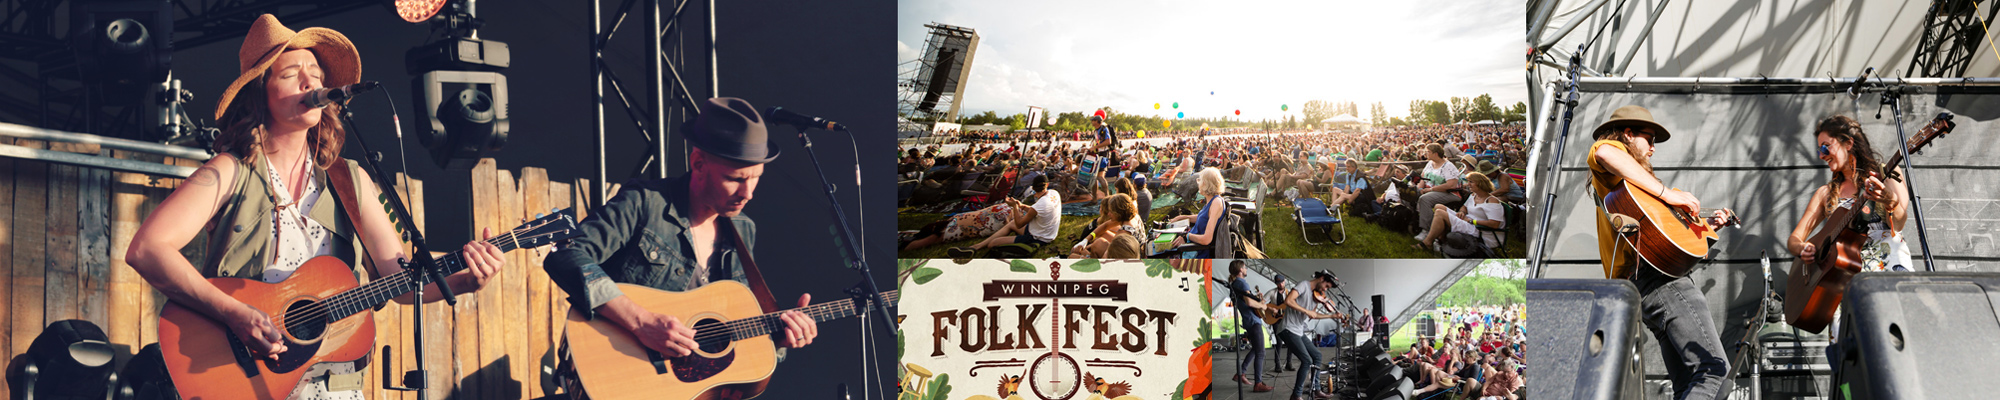 Festival musicali Canada: Winnipeg Folk Festival